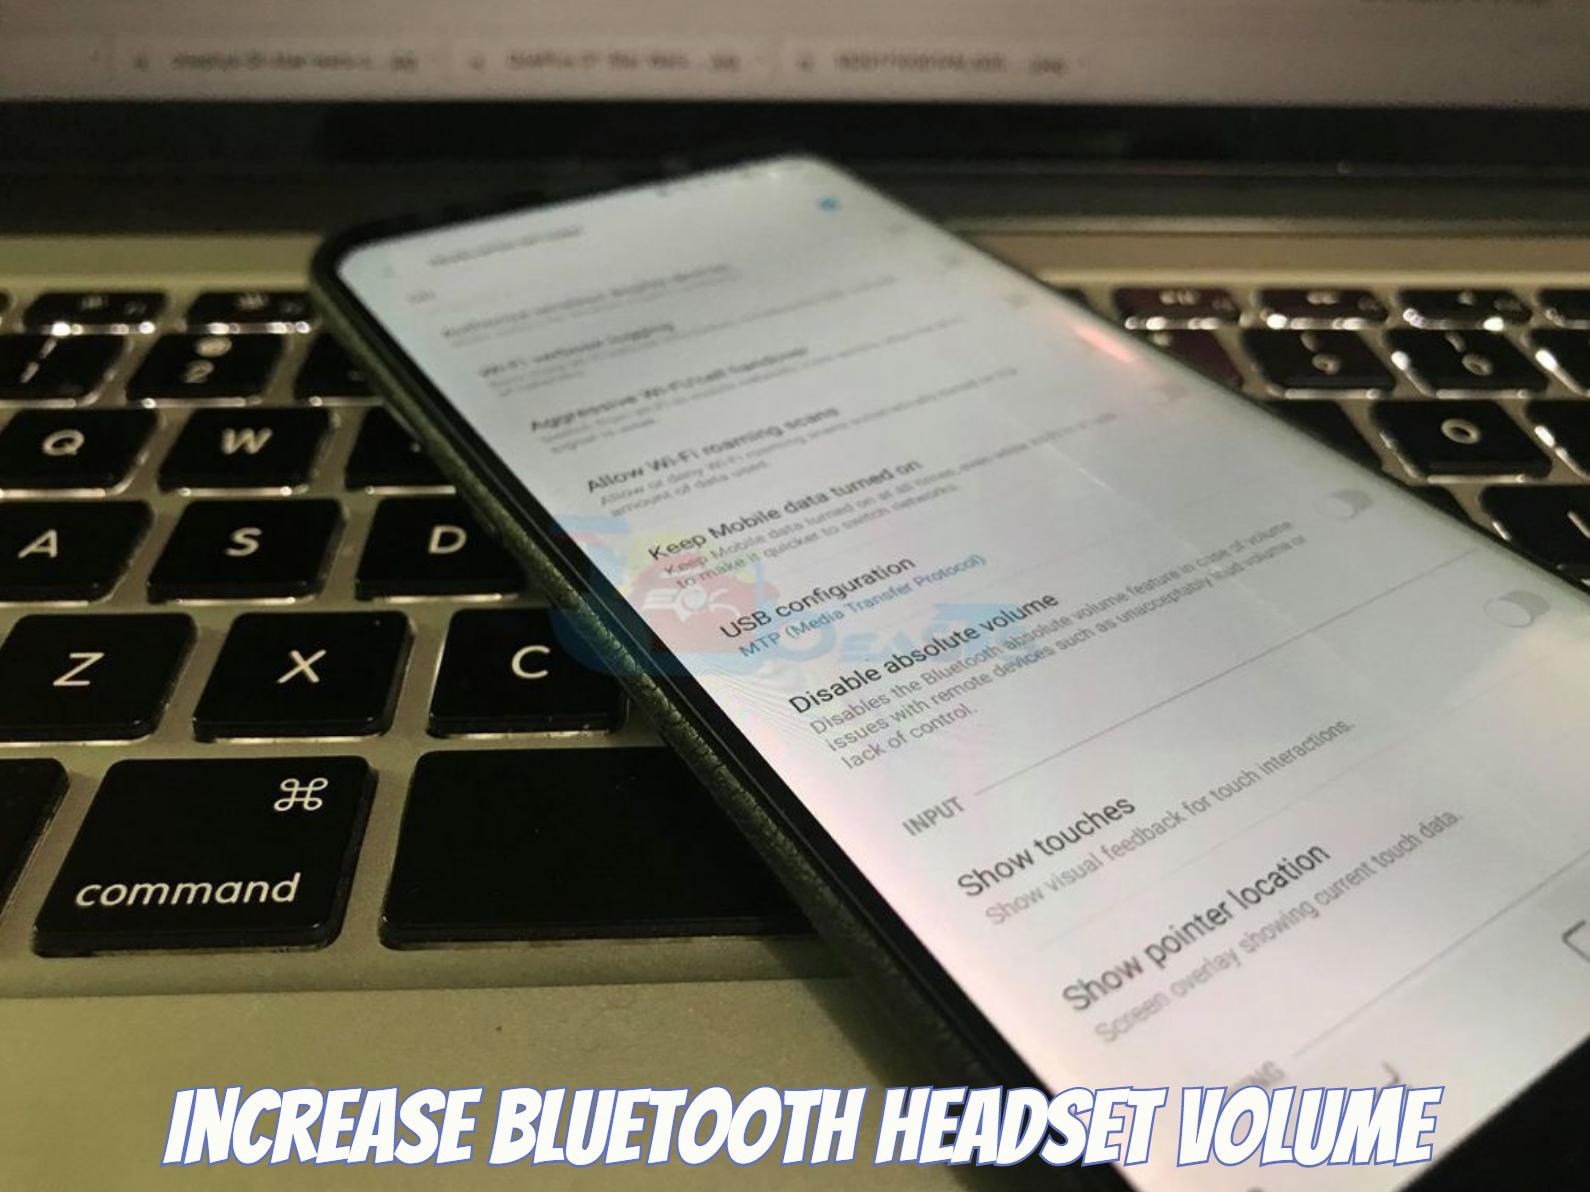 Increase Bluetooth Headset Volume